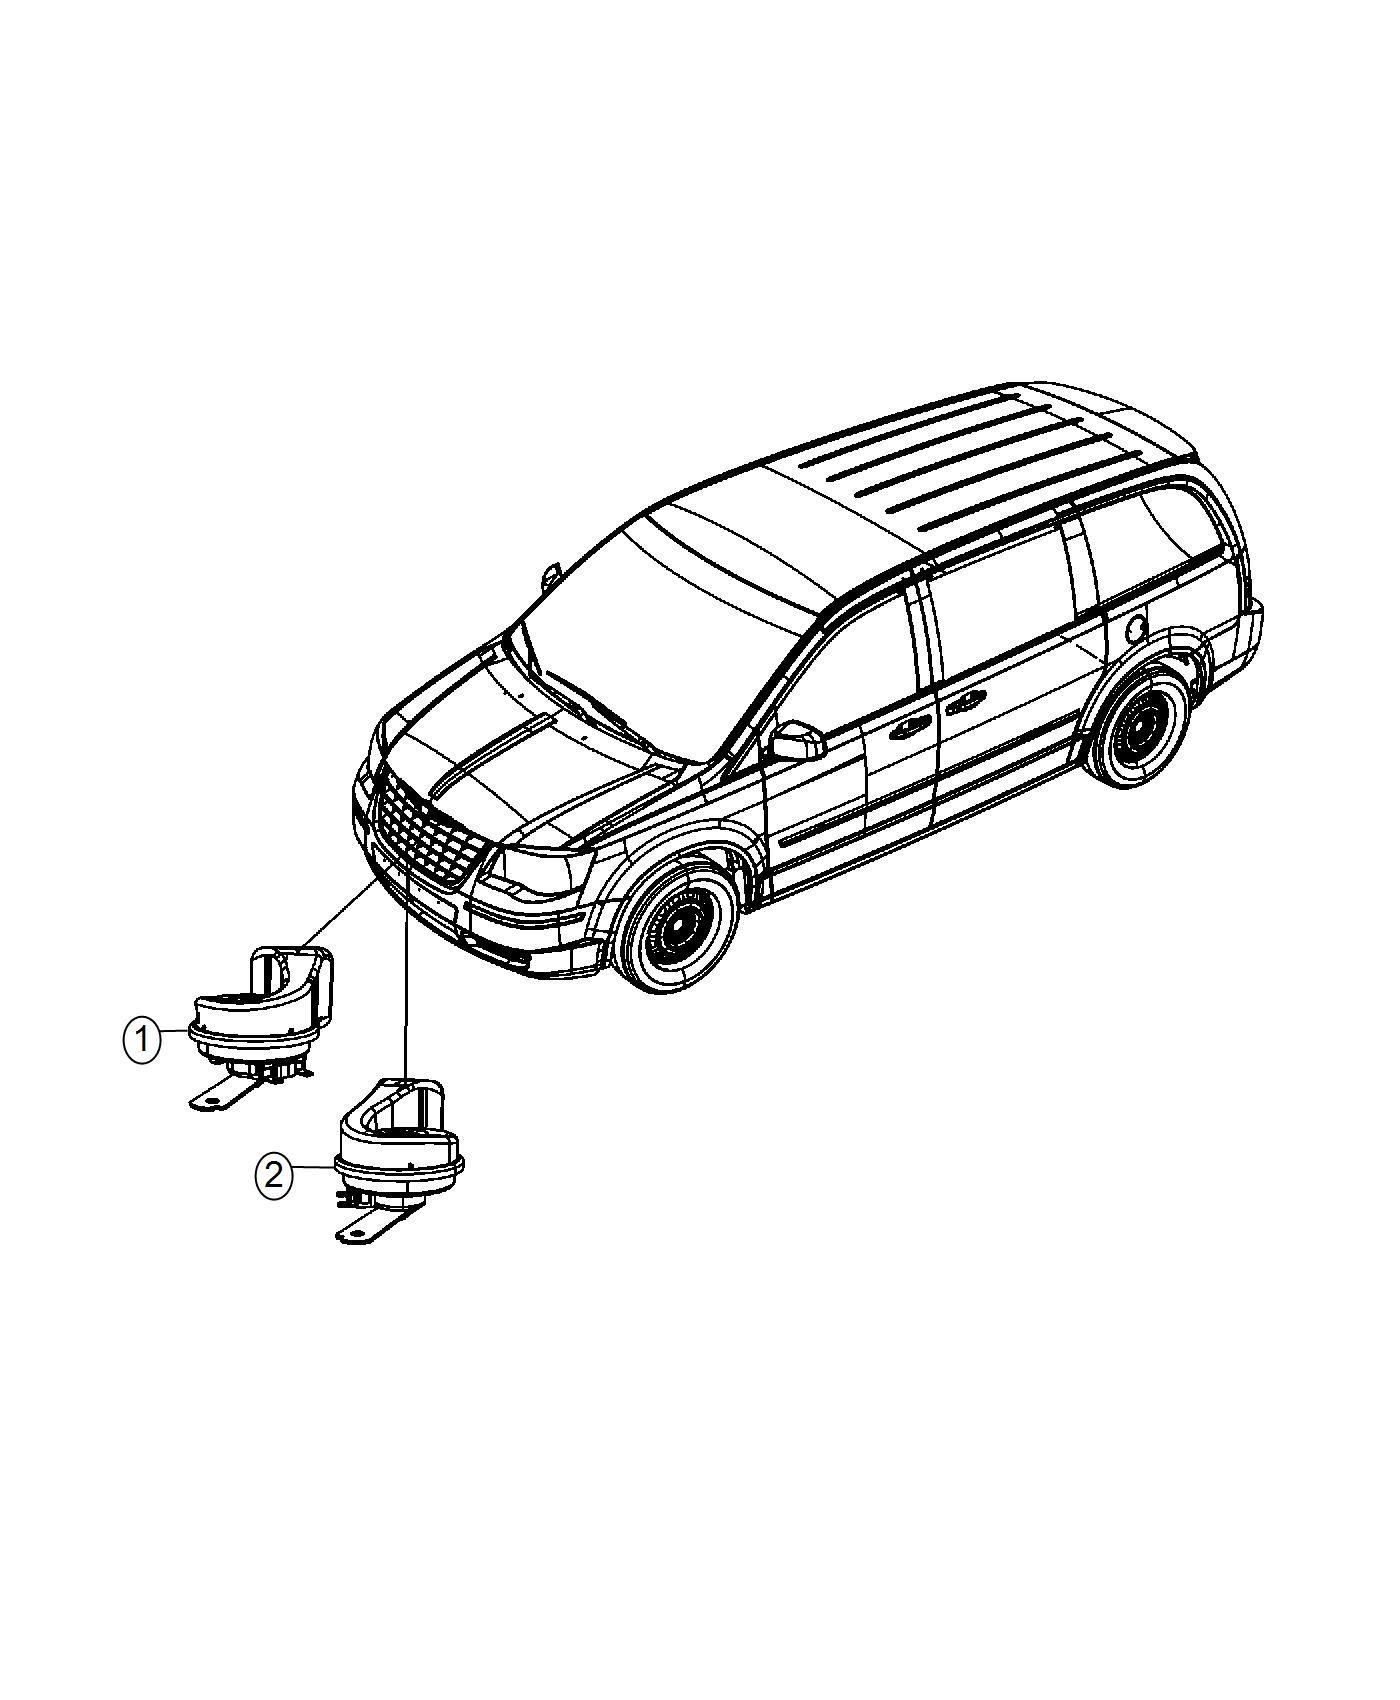 Chrysler Town Amp Country Horn And Bracket High Note Jjb